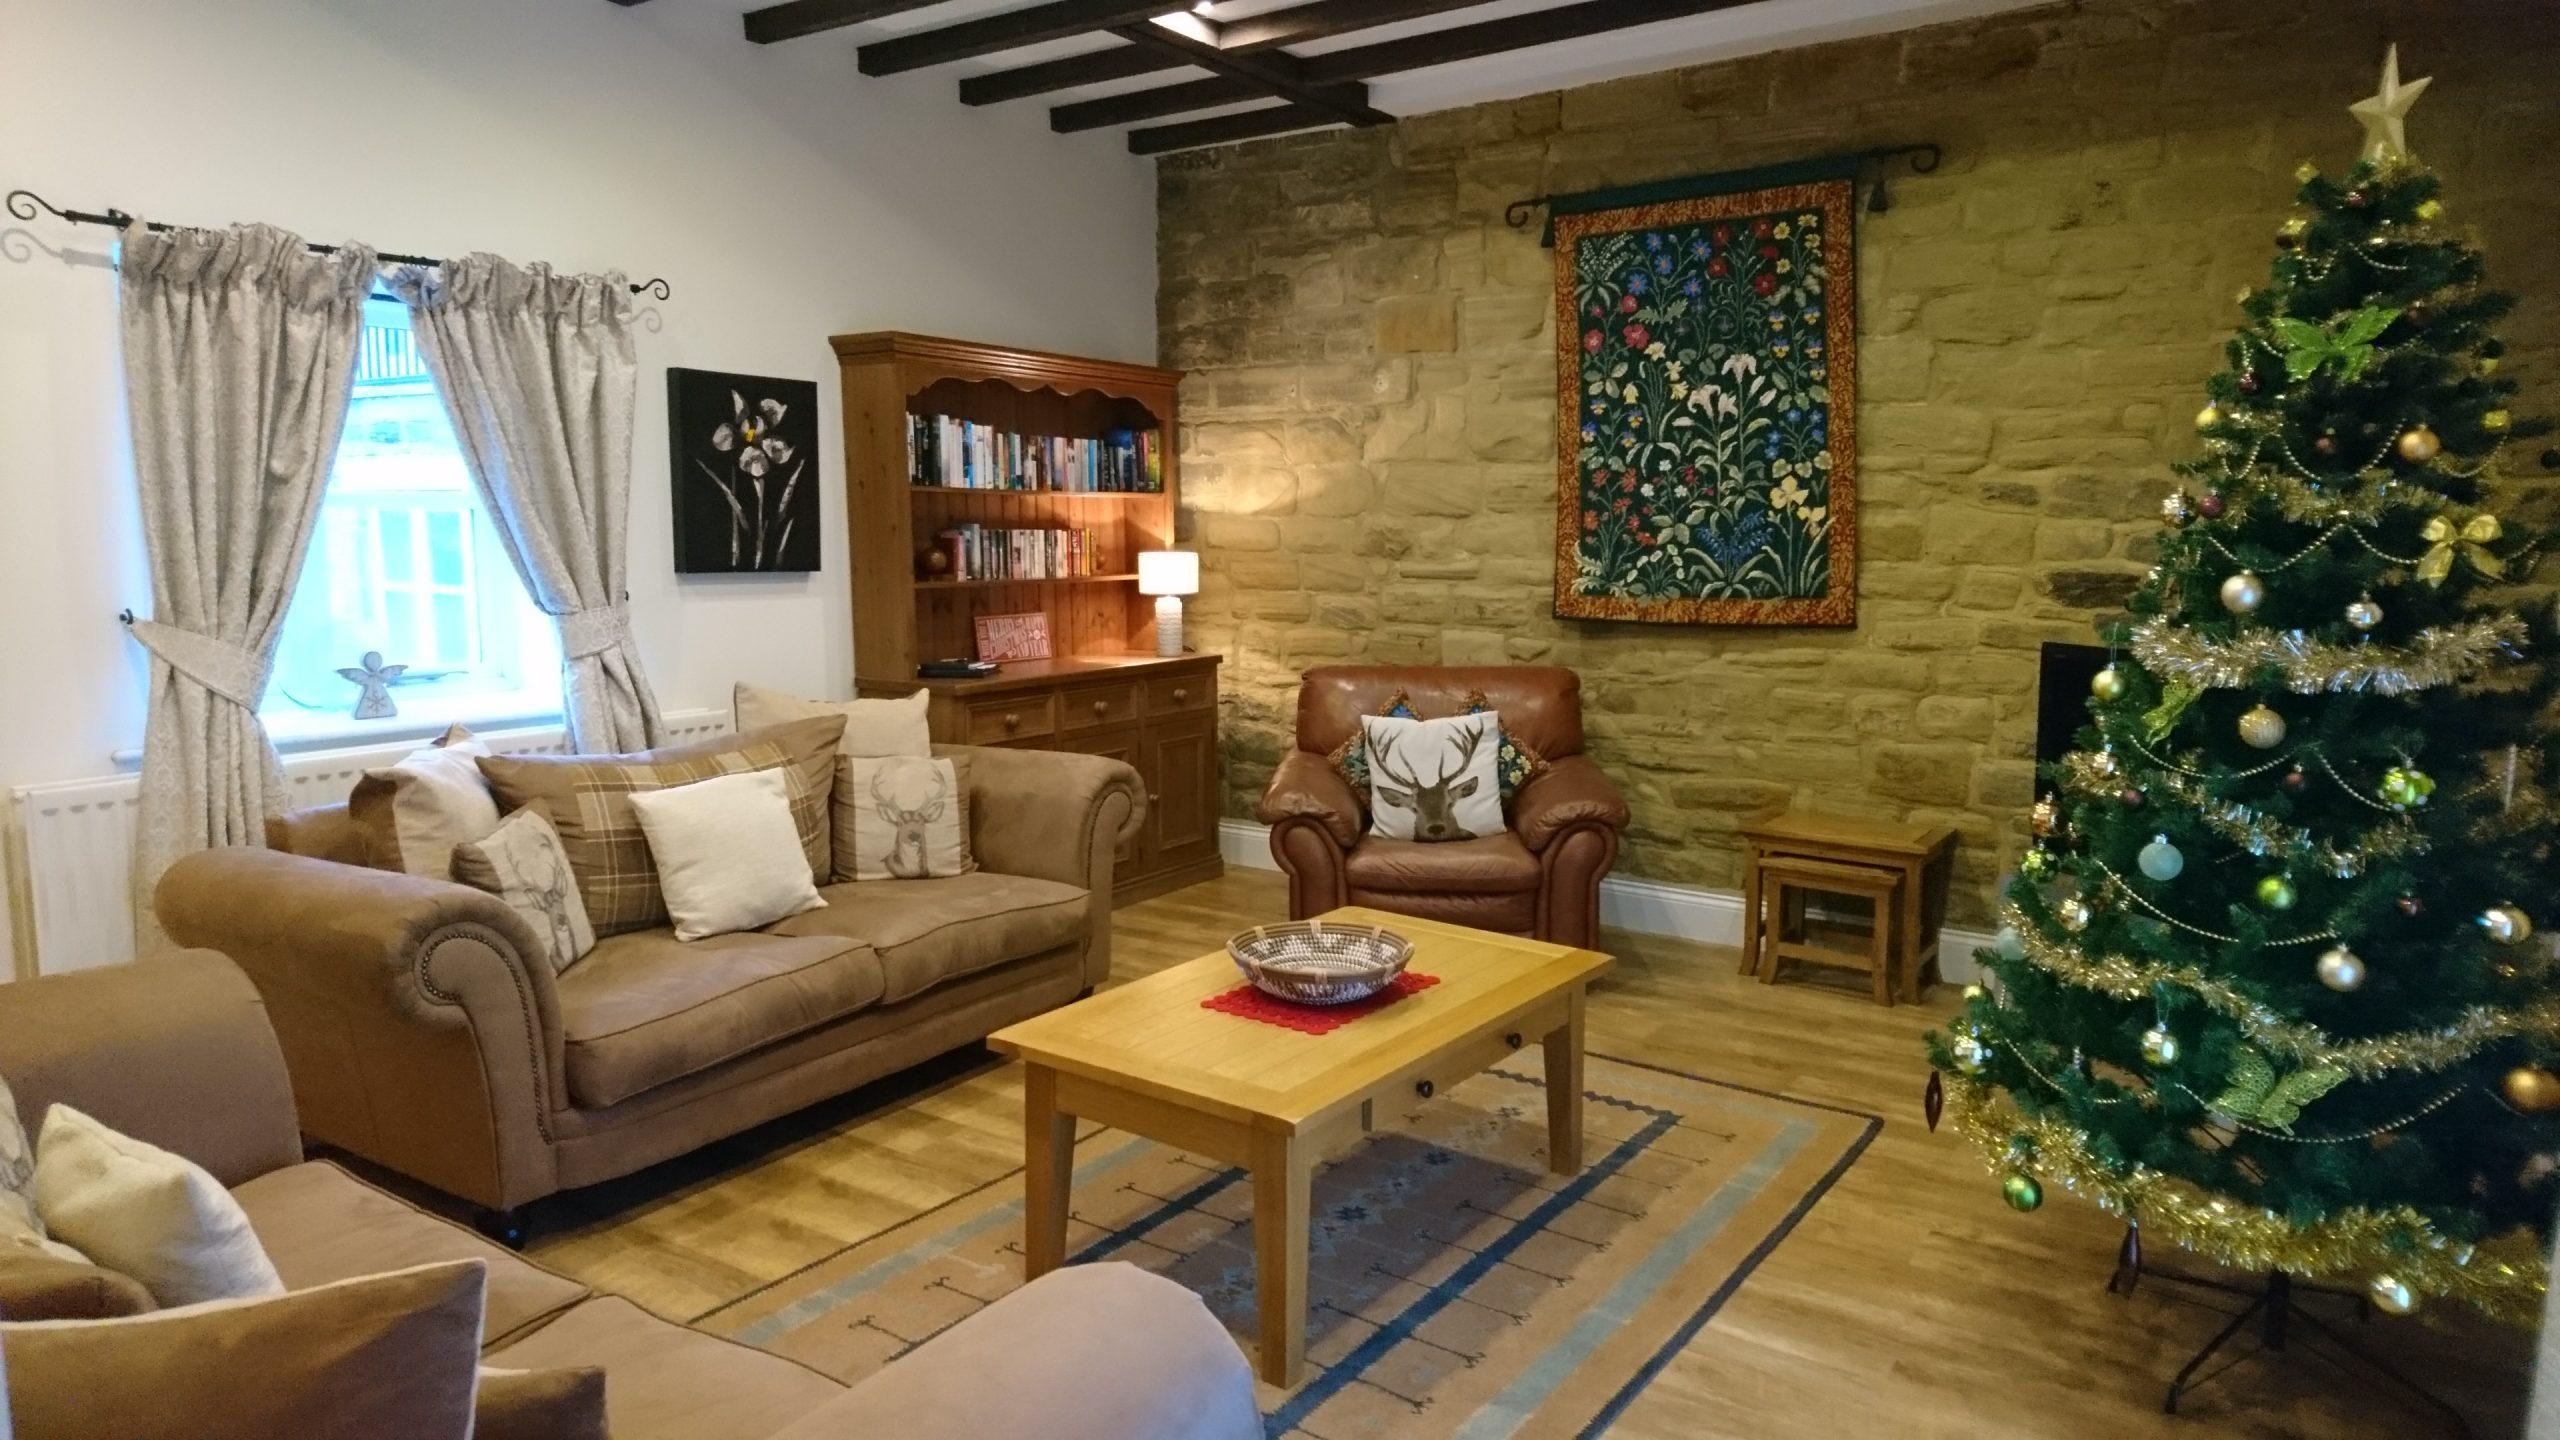 Christmas and New Year at Burradon Farm | Haselor House | Burradon Farm Houses & Cottages